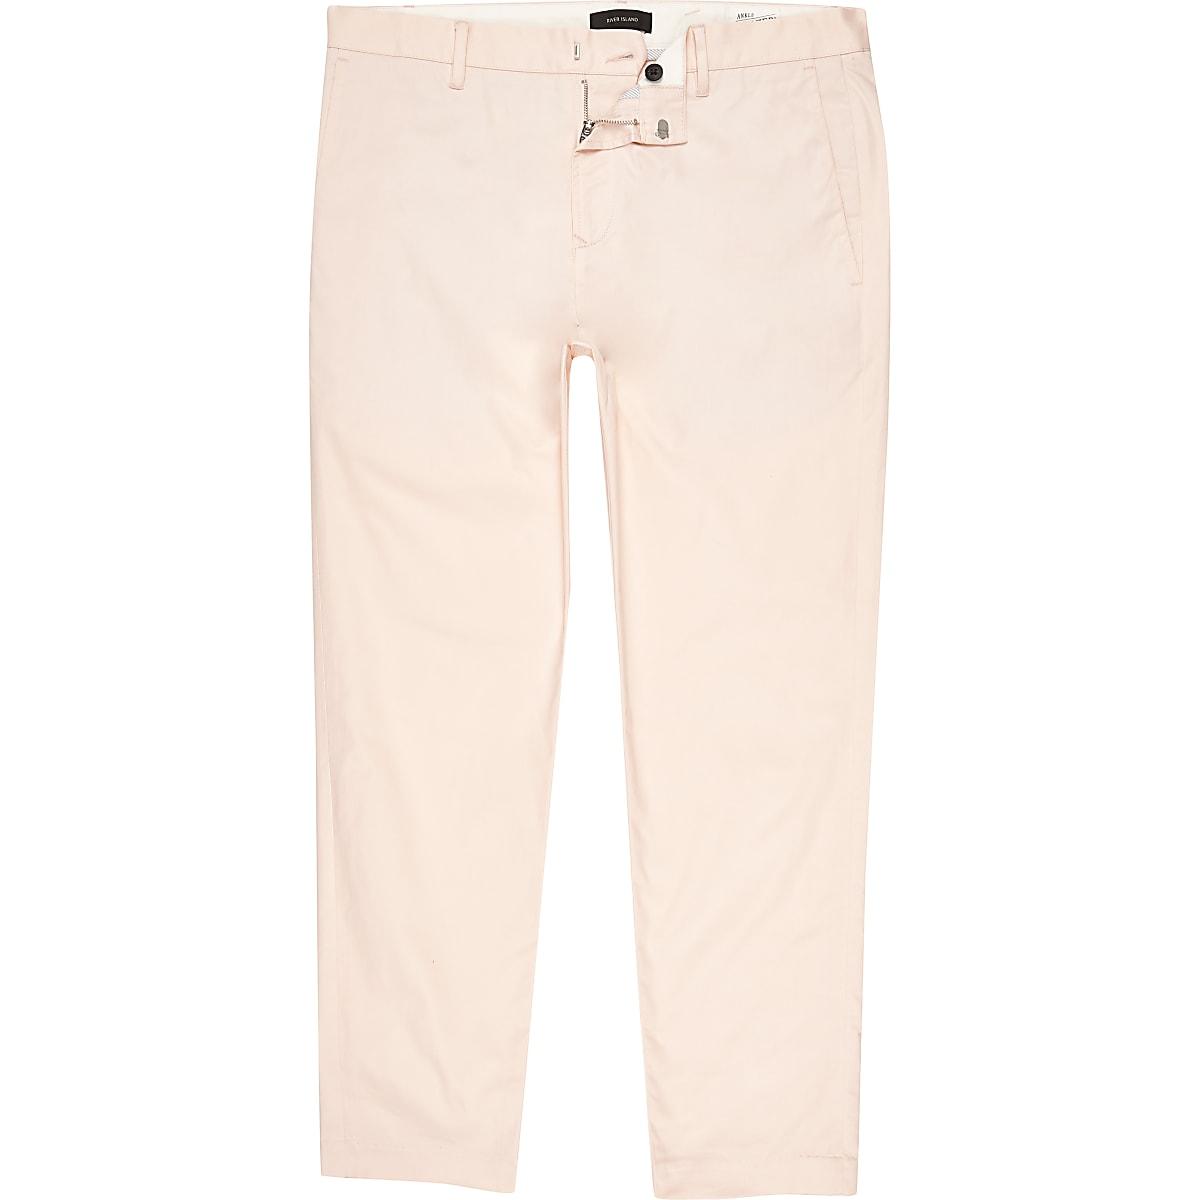 Peach slim fit ankle grazer chino pants